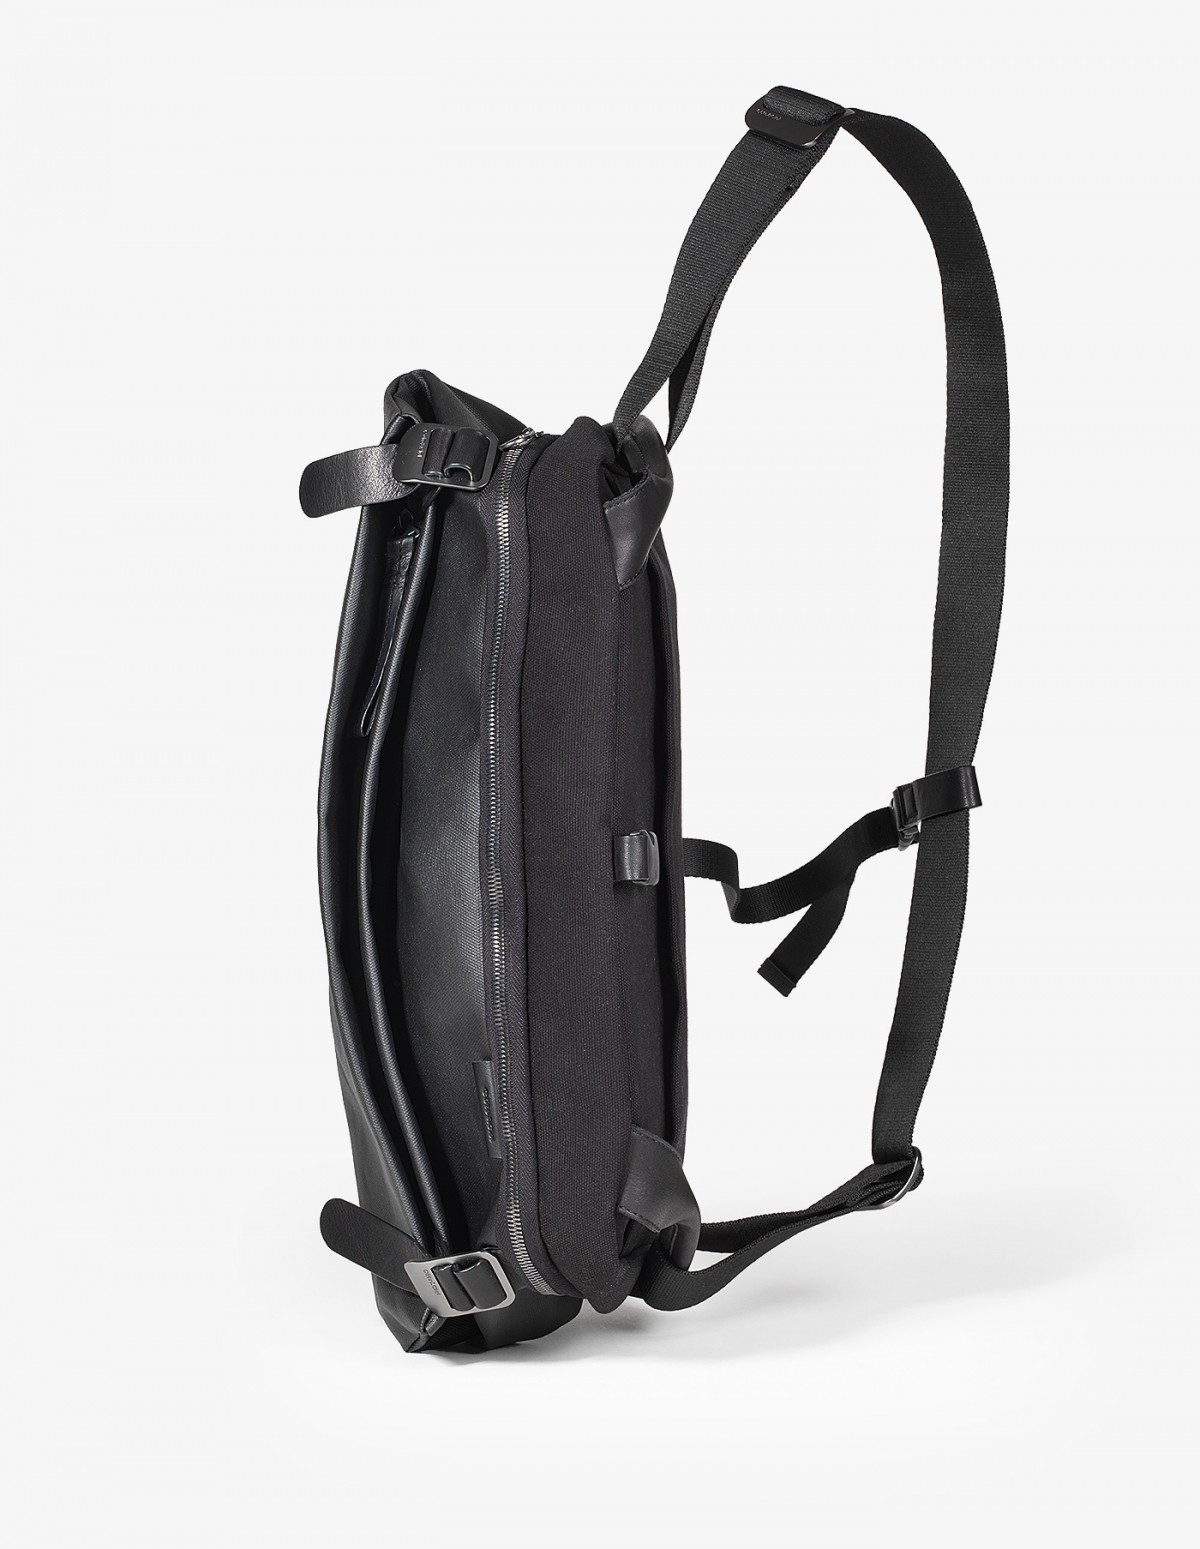 Cote & Ciel Riss Bag in Black Coated Canvas